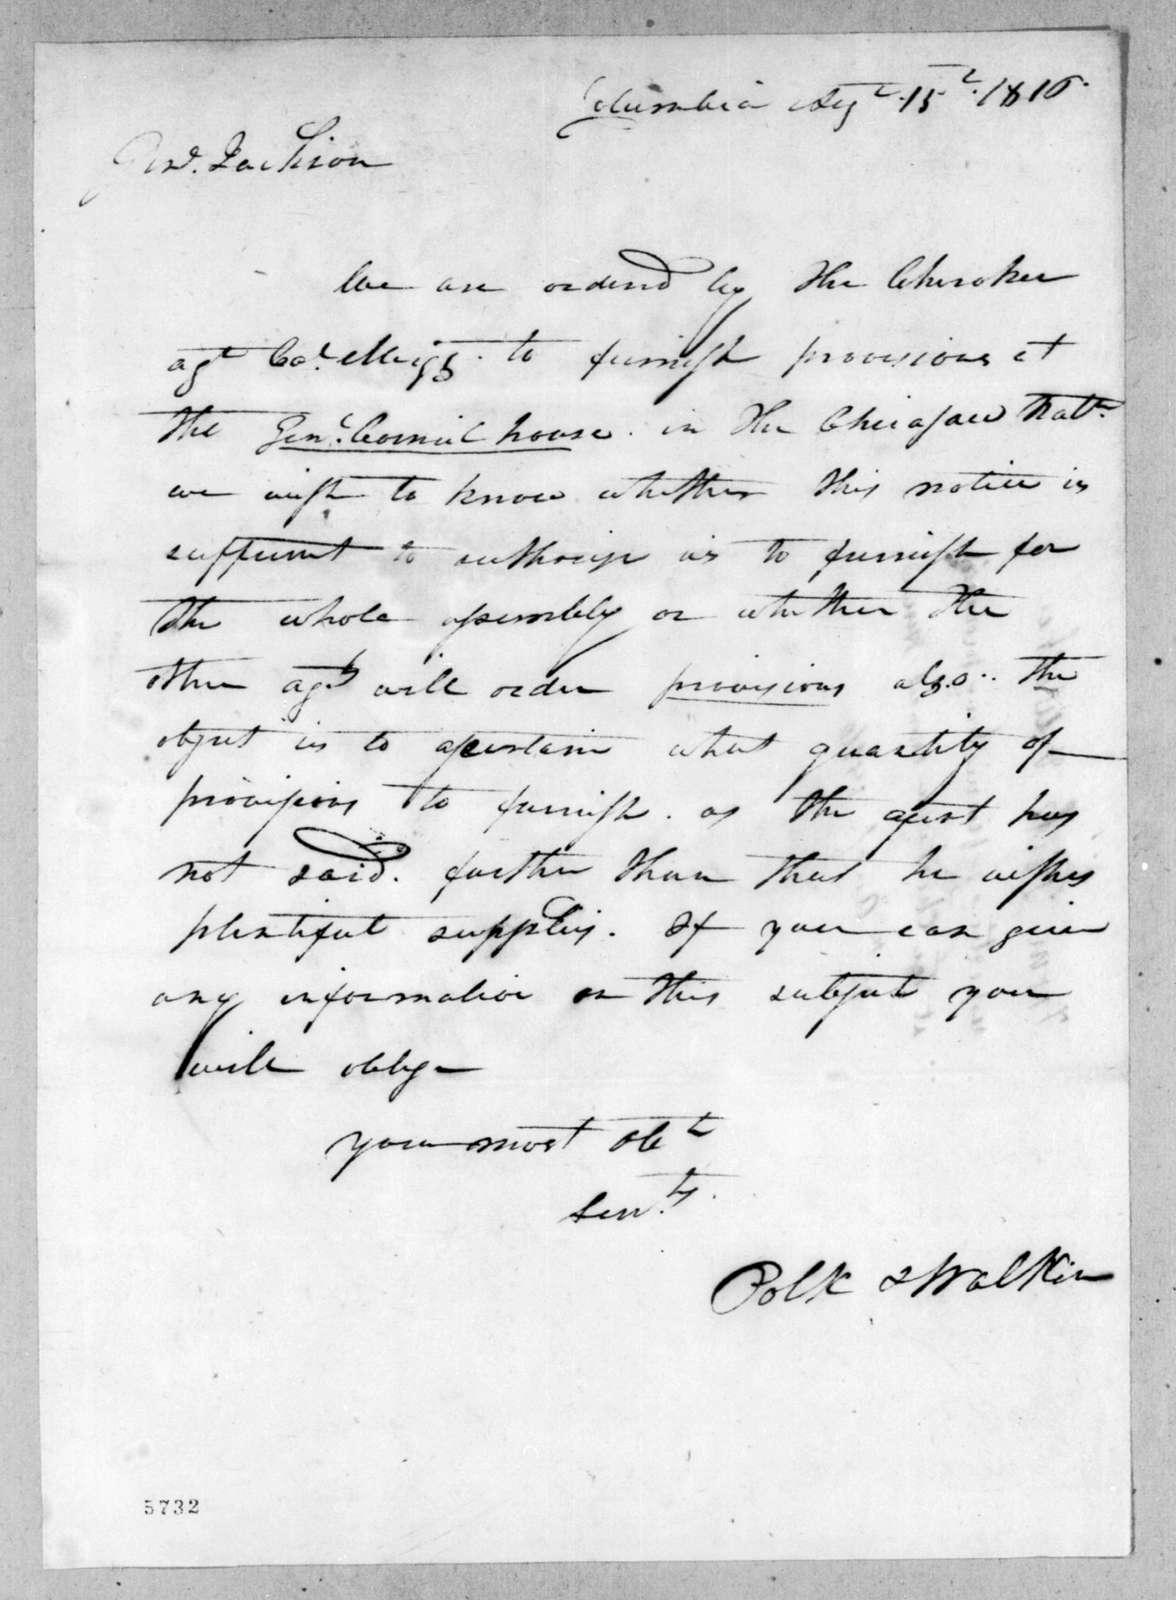 Polk & Walker to Andrew Jackson, August 15, 1816